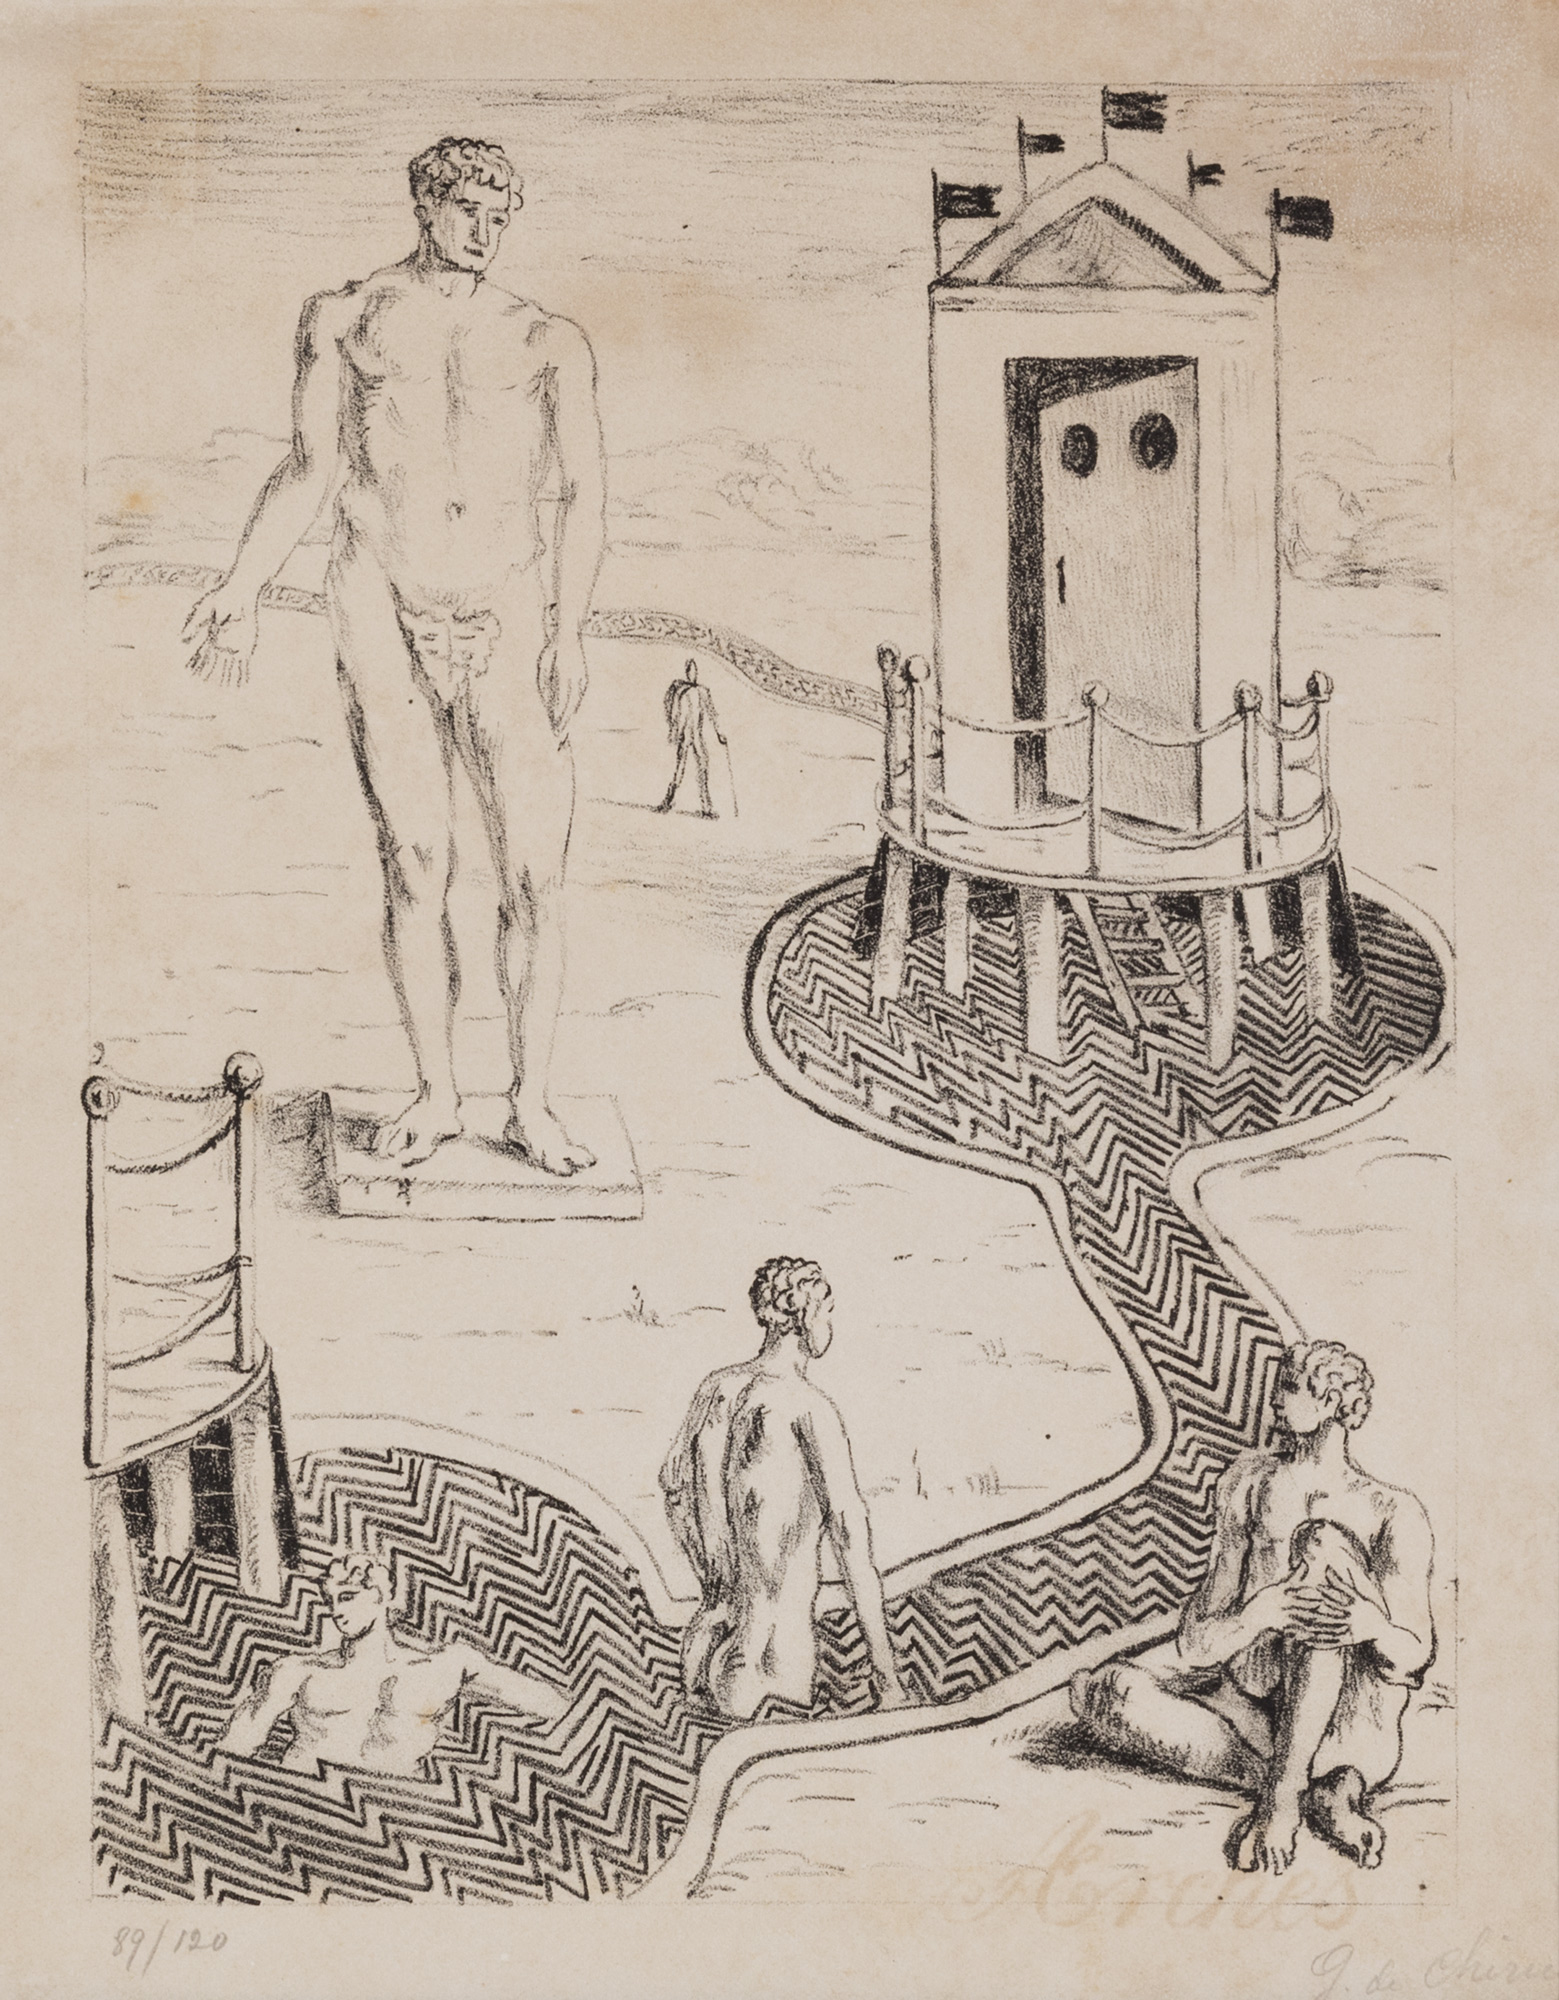 L'Idolo nei bagni misteriosi, 1934